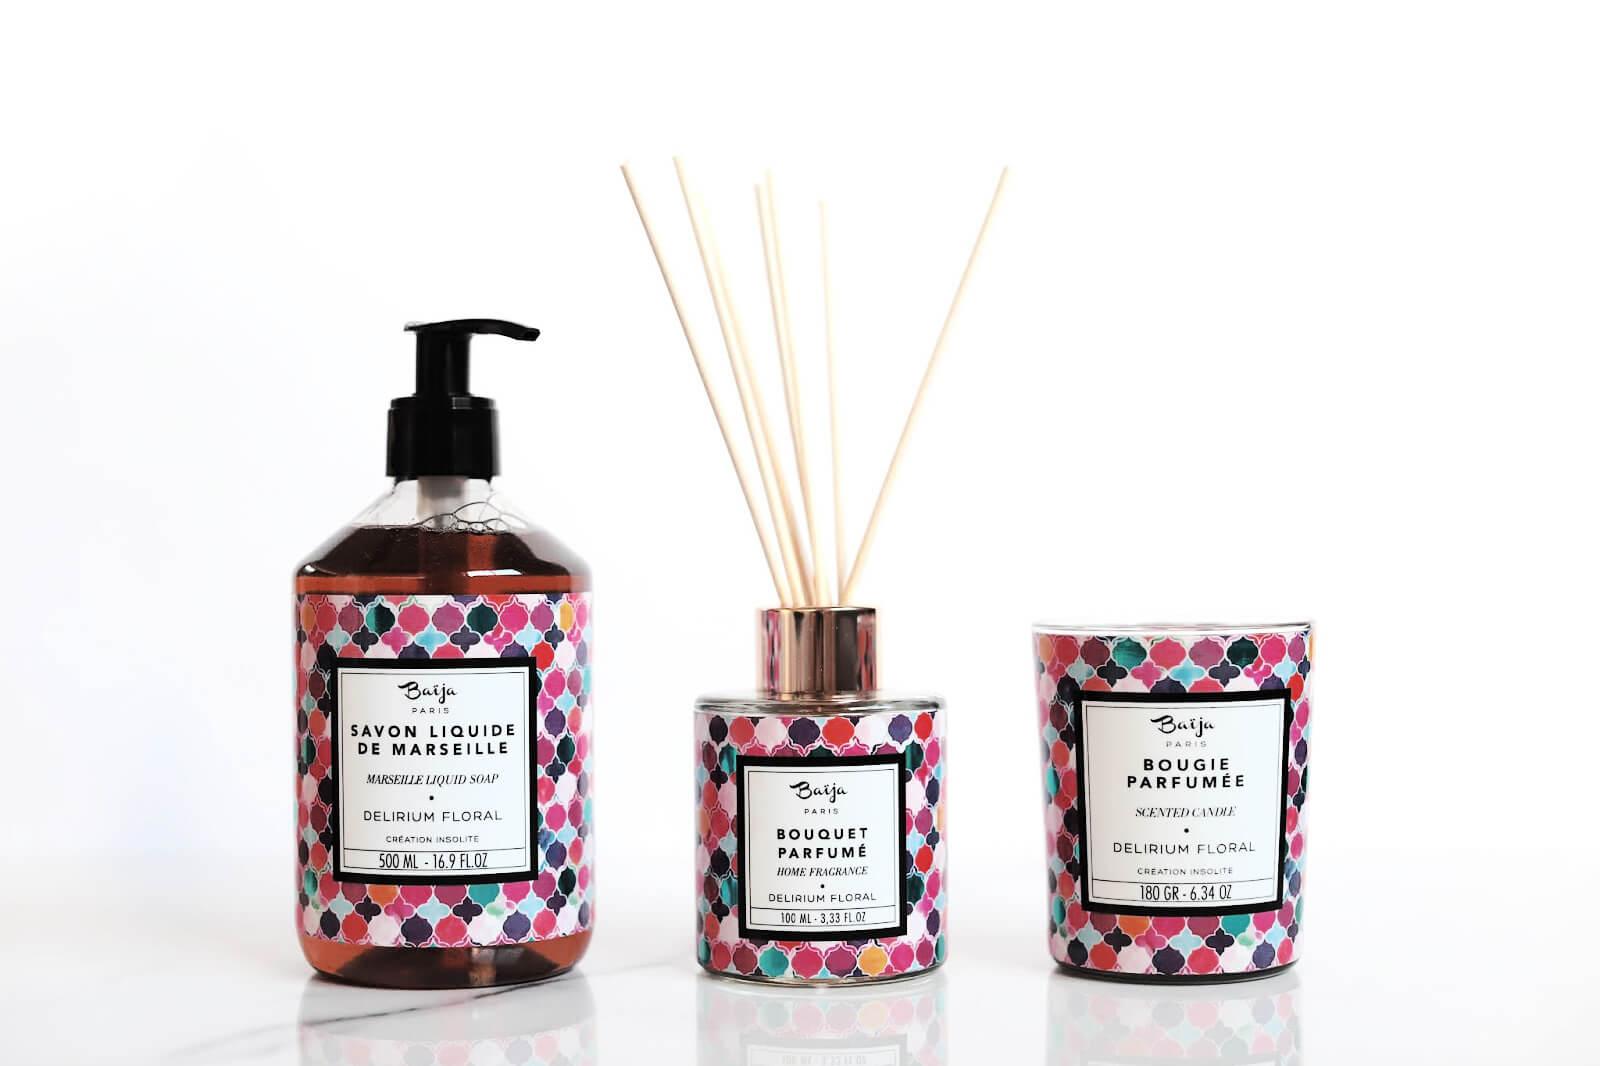 baija-delirium-floral-nouvelle-gamme-parfumee-avis-test